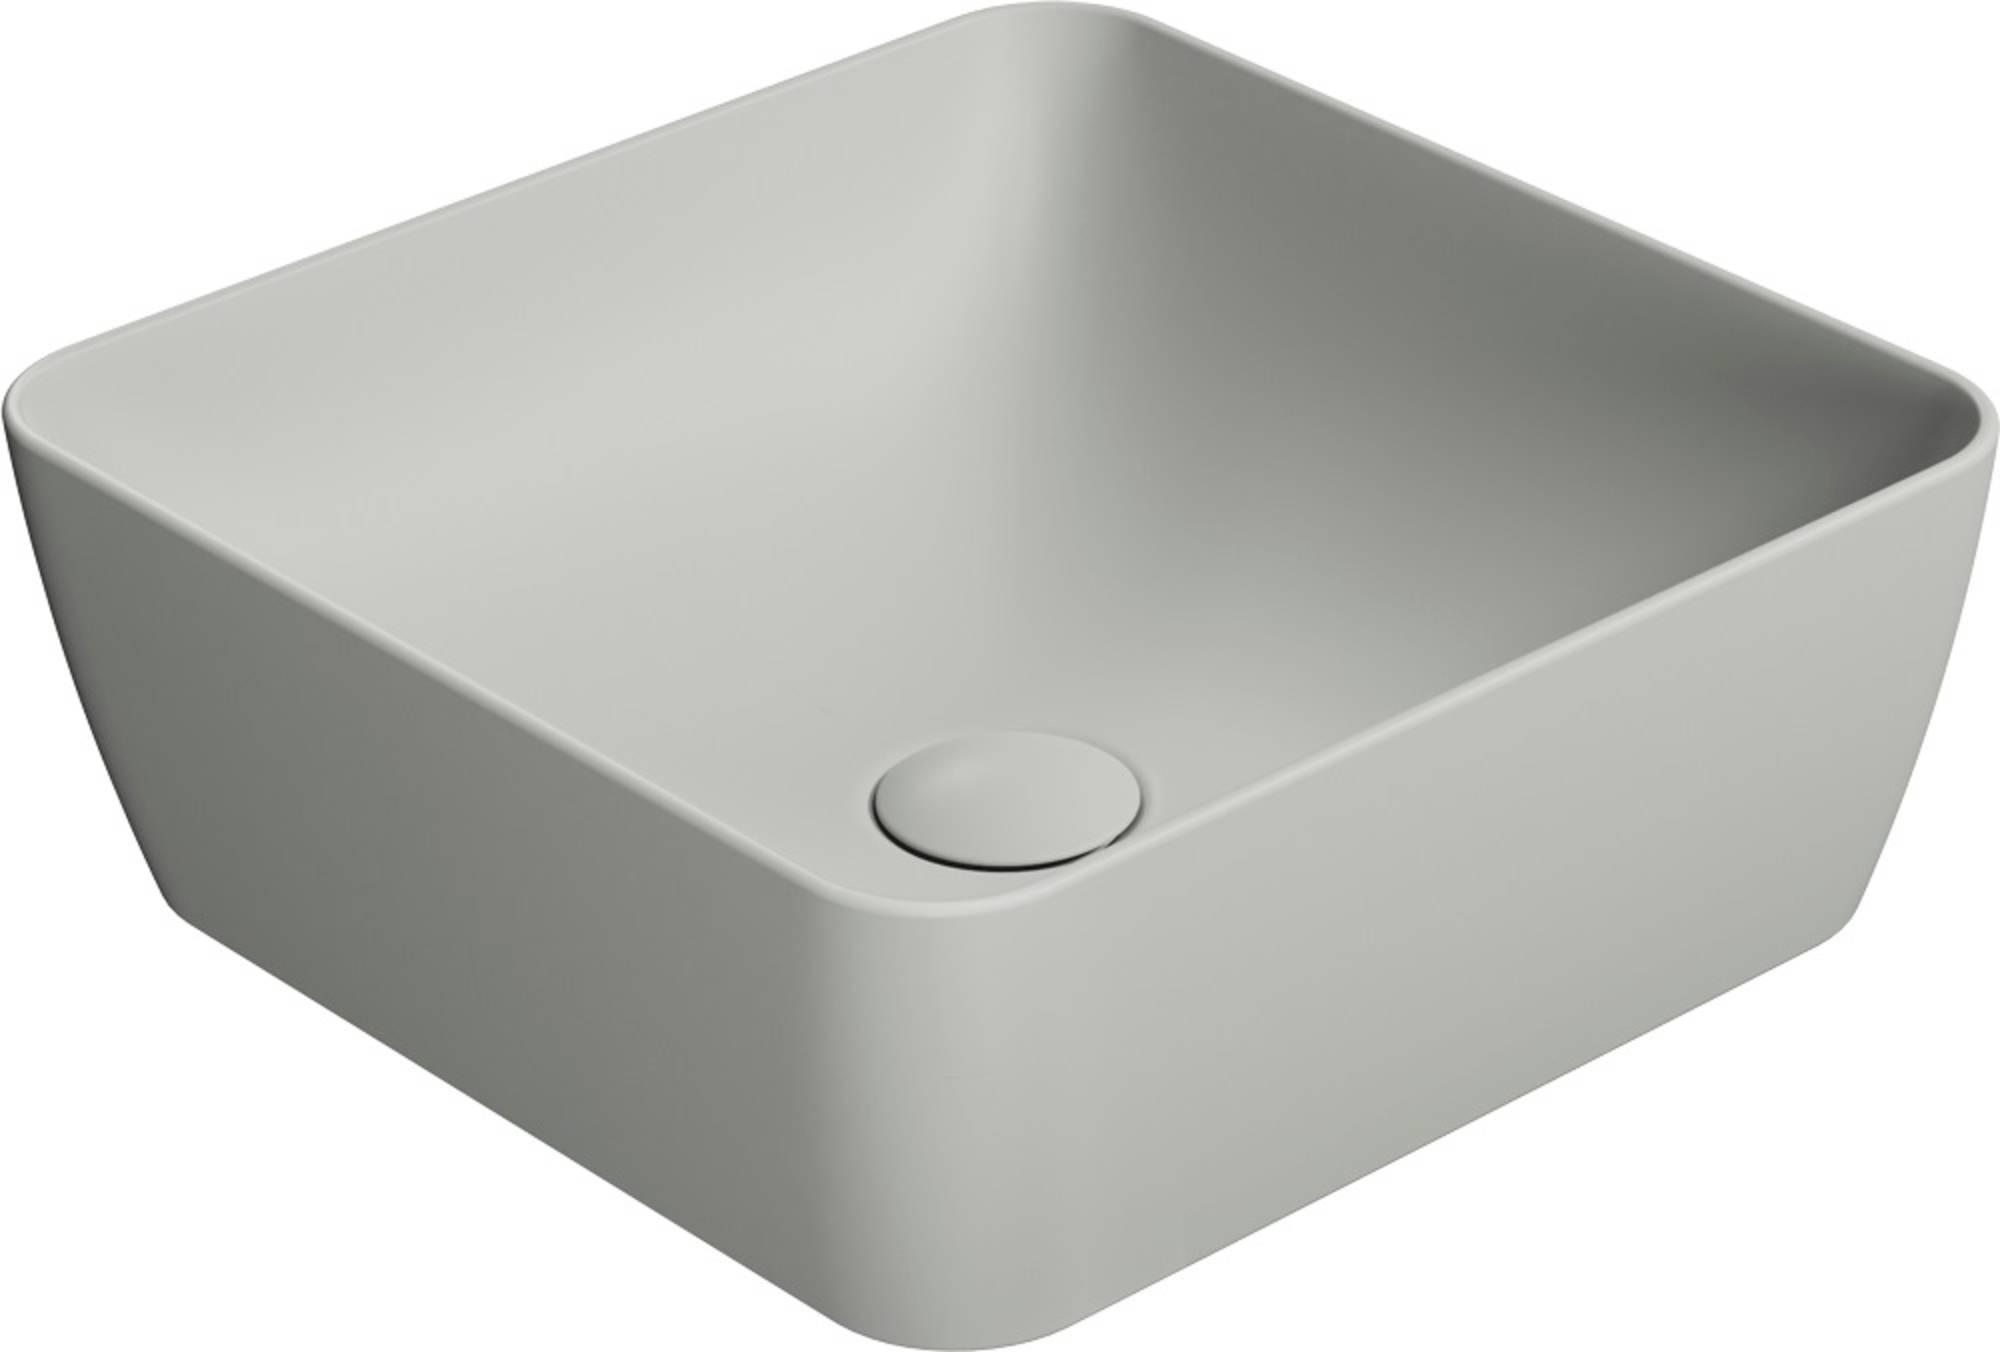 Ben Stilo Opzetkom Keramiek 38x38x14 cm Cement Grijs